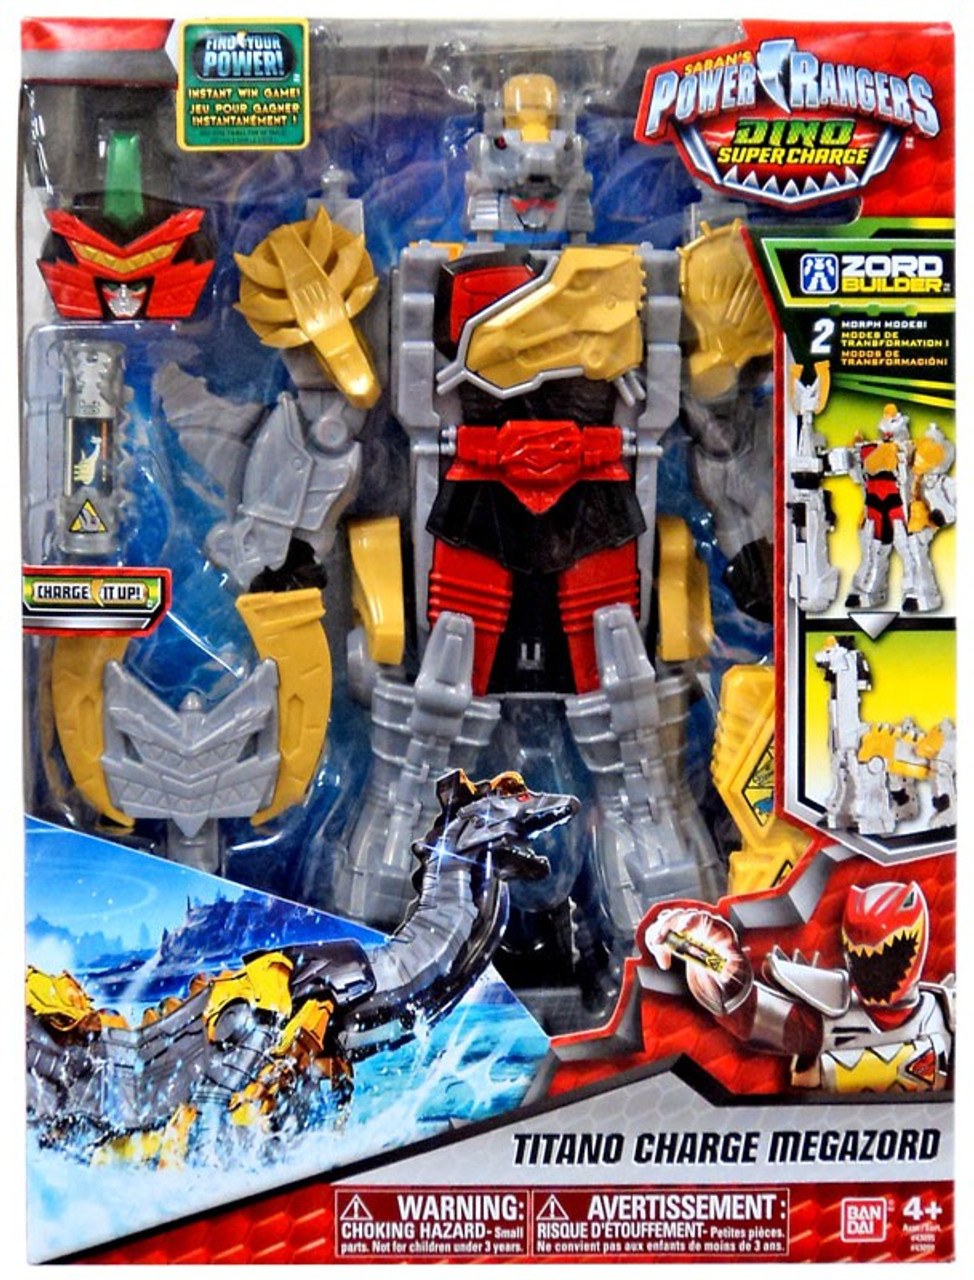 Power Rangers Dino Super Charge Titano Charge Megazord